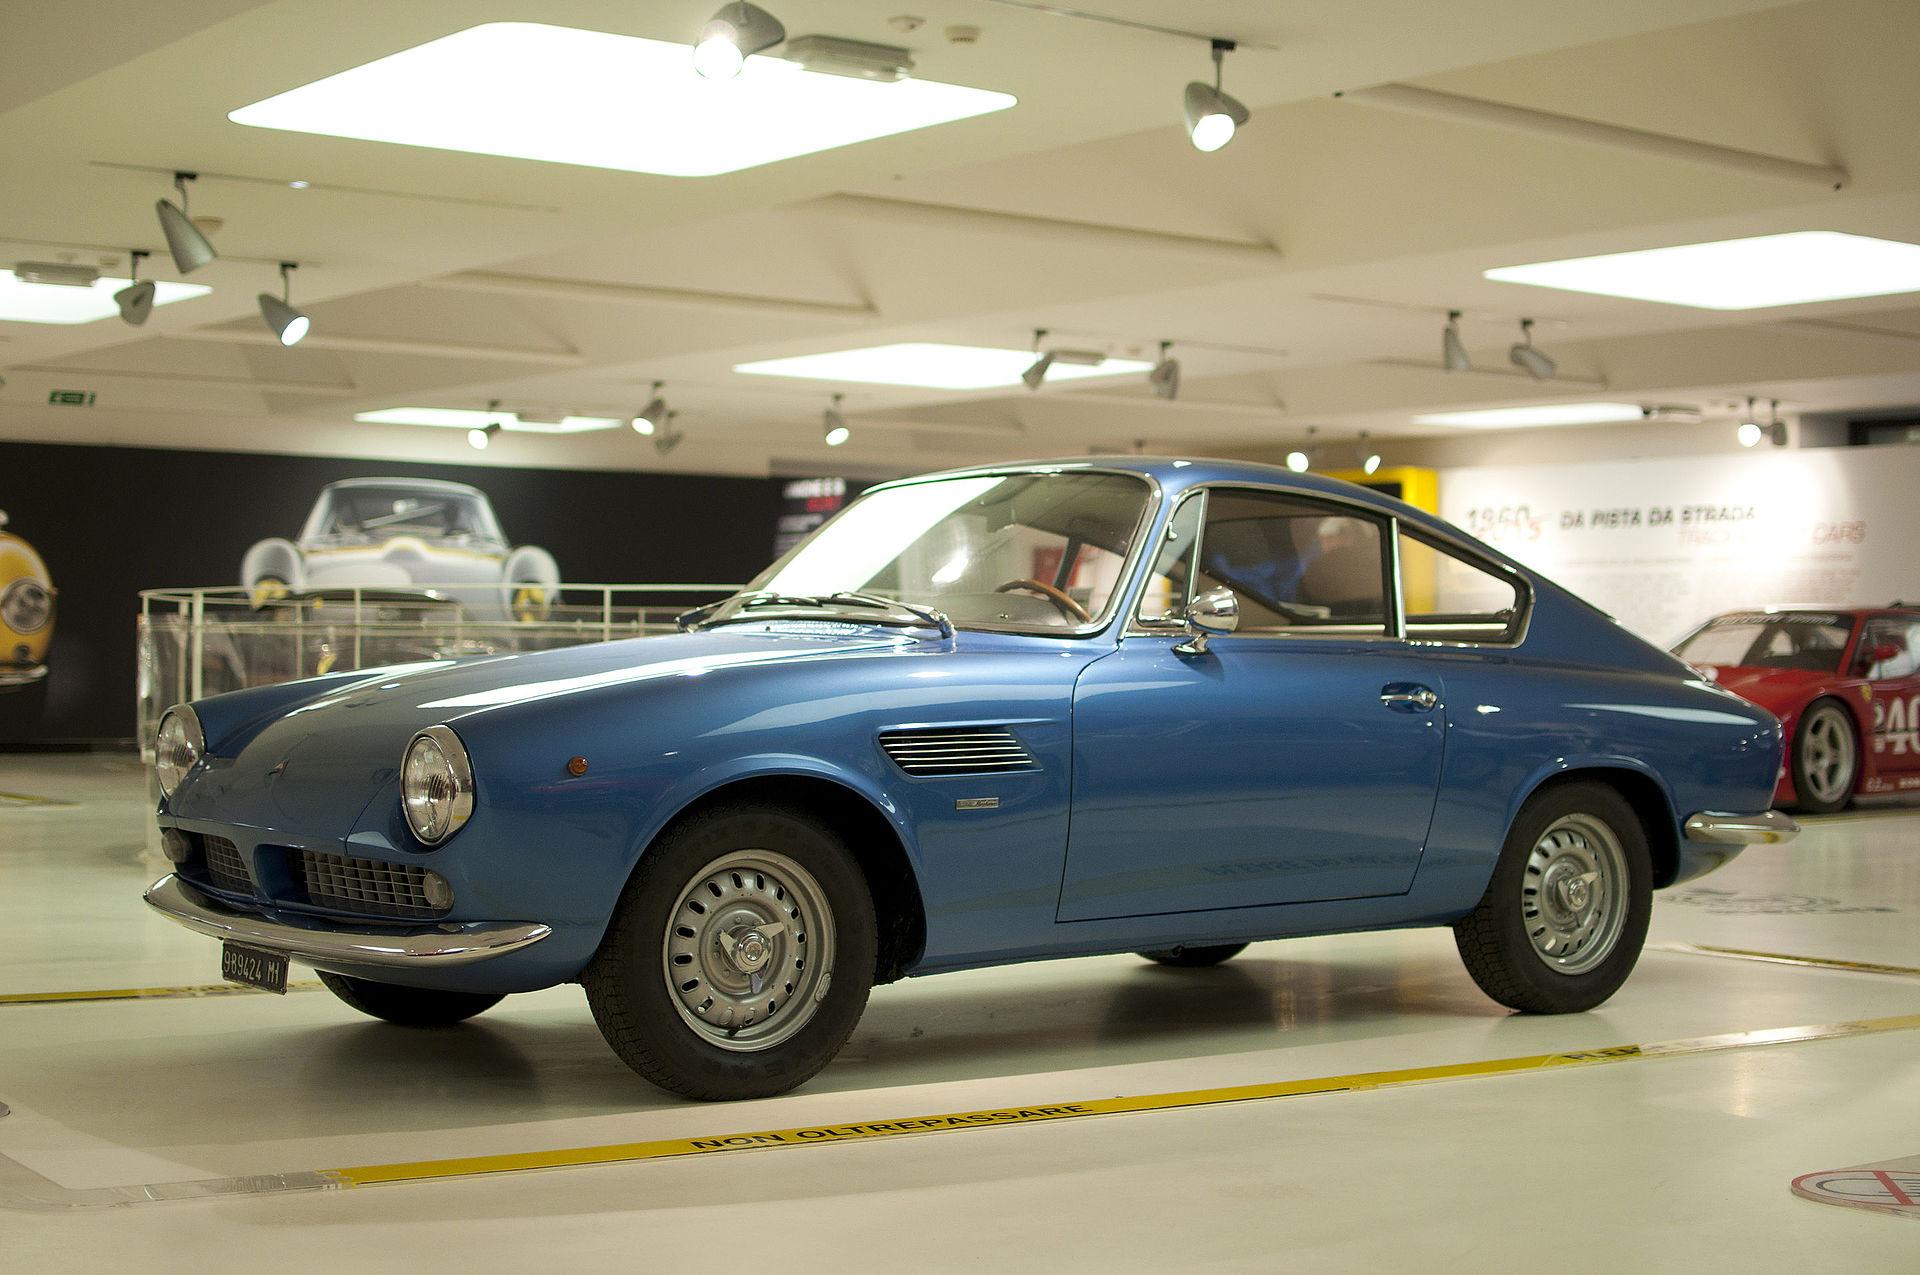 [Image: 1920px-ASA_1000_GT_-_Museo_Ferrari_%2817...854%29.jpg]